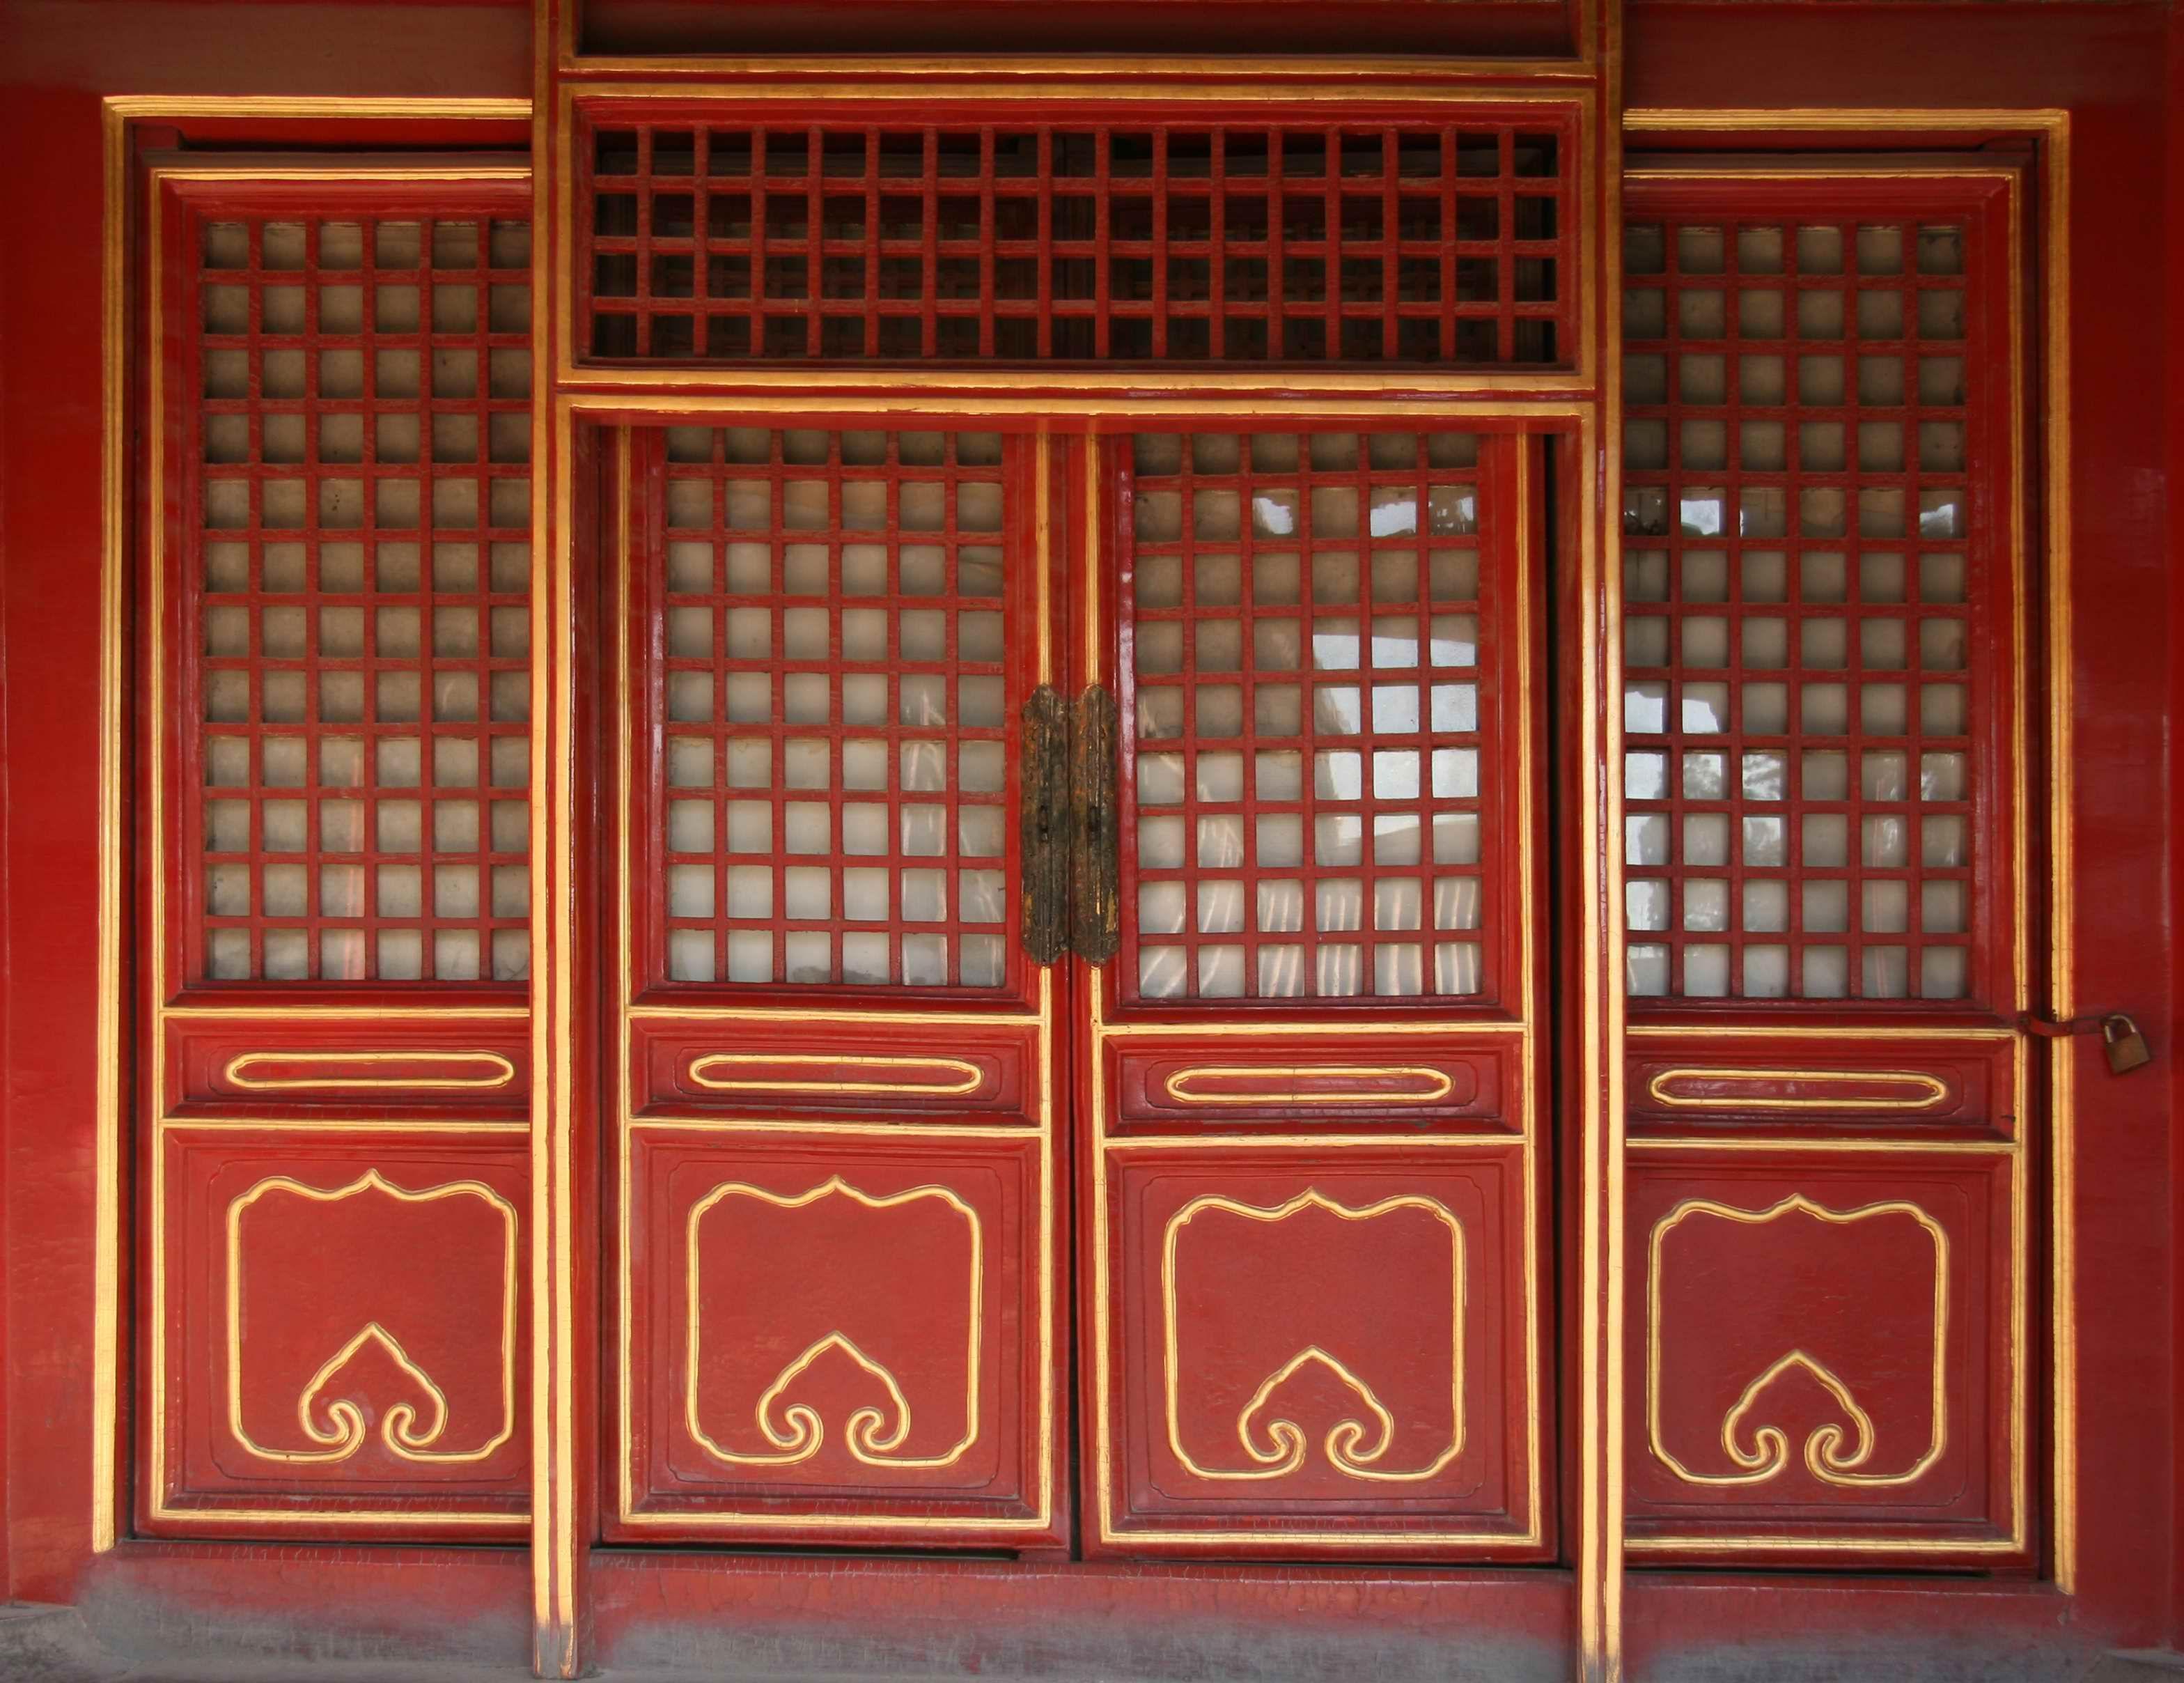 Chinese Antique Doors  Fanciful Latticework On Doors And. Wall Mount Media Shelf. Outdoor Soaking Tub. Blue Subway Tile Backsplash. Red Tv Stand. Rustic Homes. Metal Tile Backsplash. Light Wood Nightstand. Native Trails